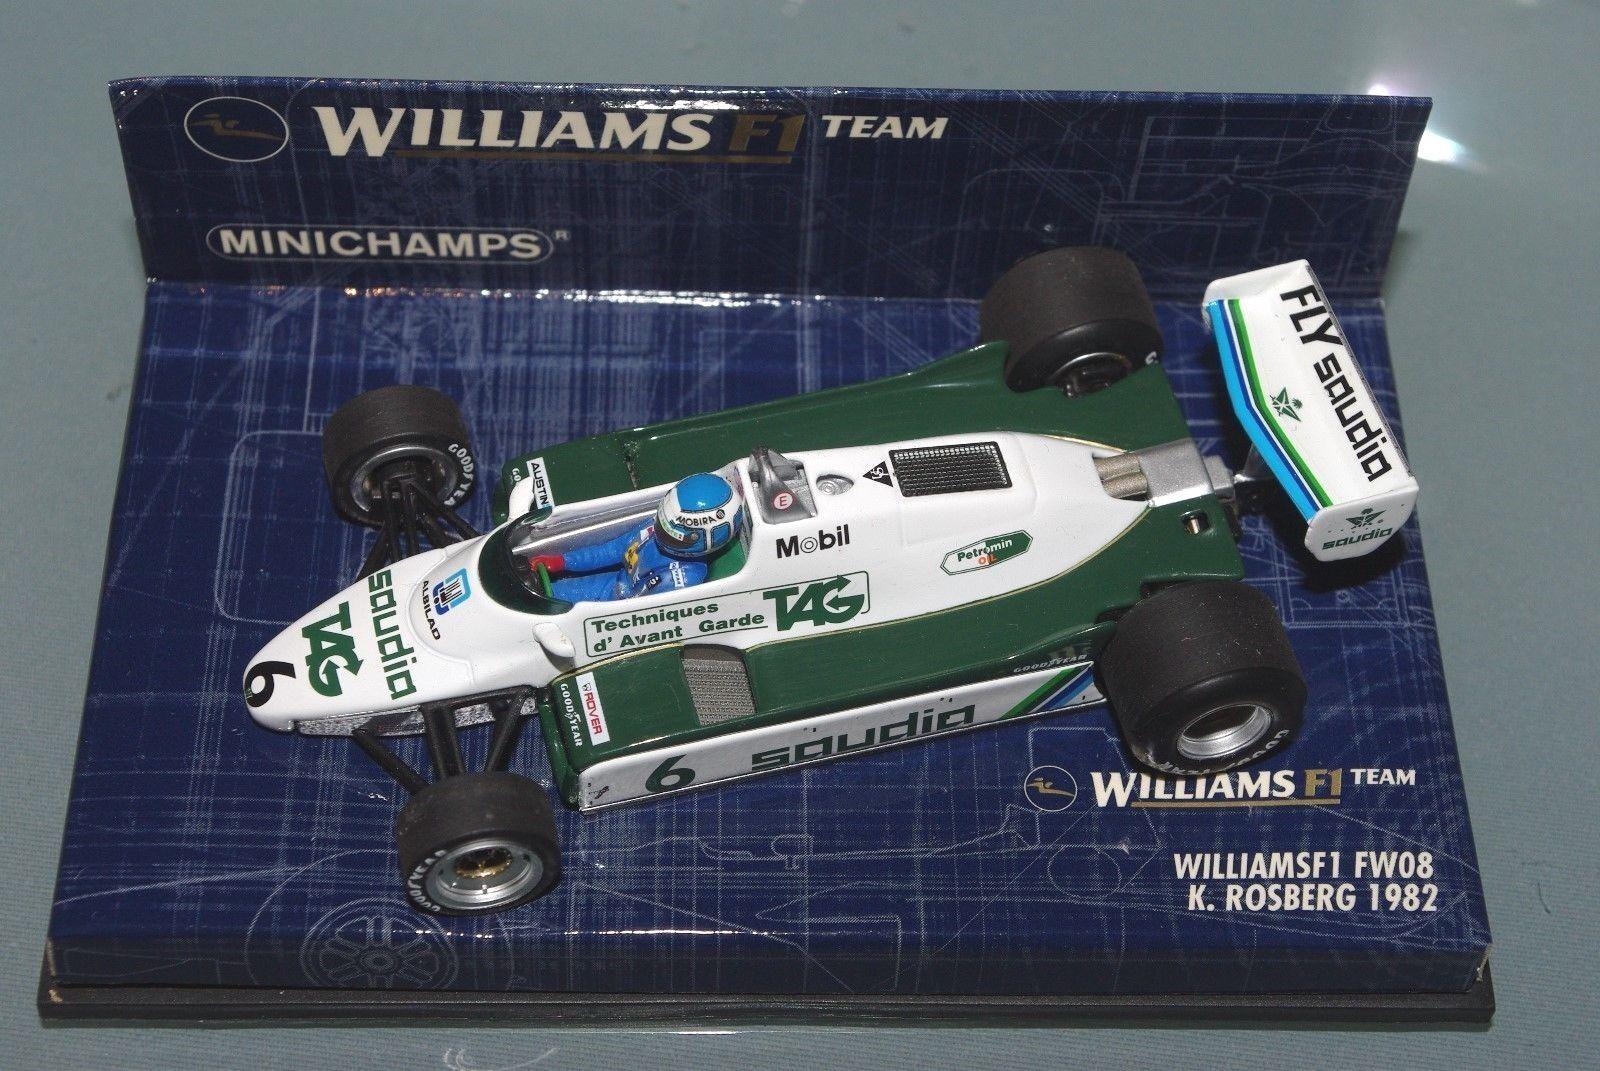 calidad auténtica Minichamps 1 43 F1 F1 F1 Williams FW08 Arabia Tag-Keke Rosberg-campeón mundial de 1982  barato